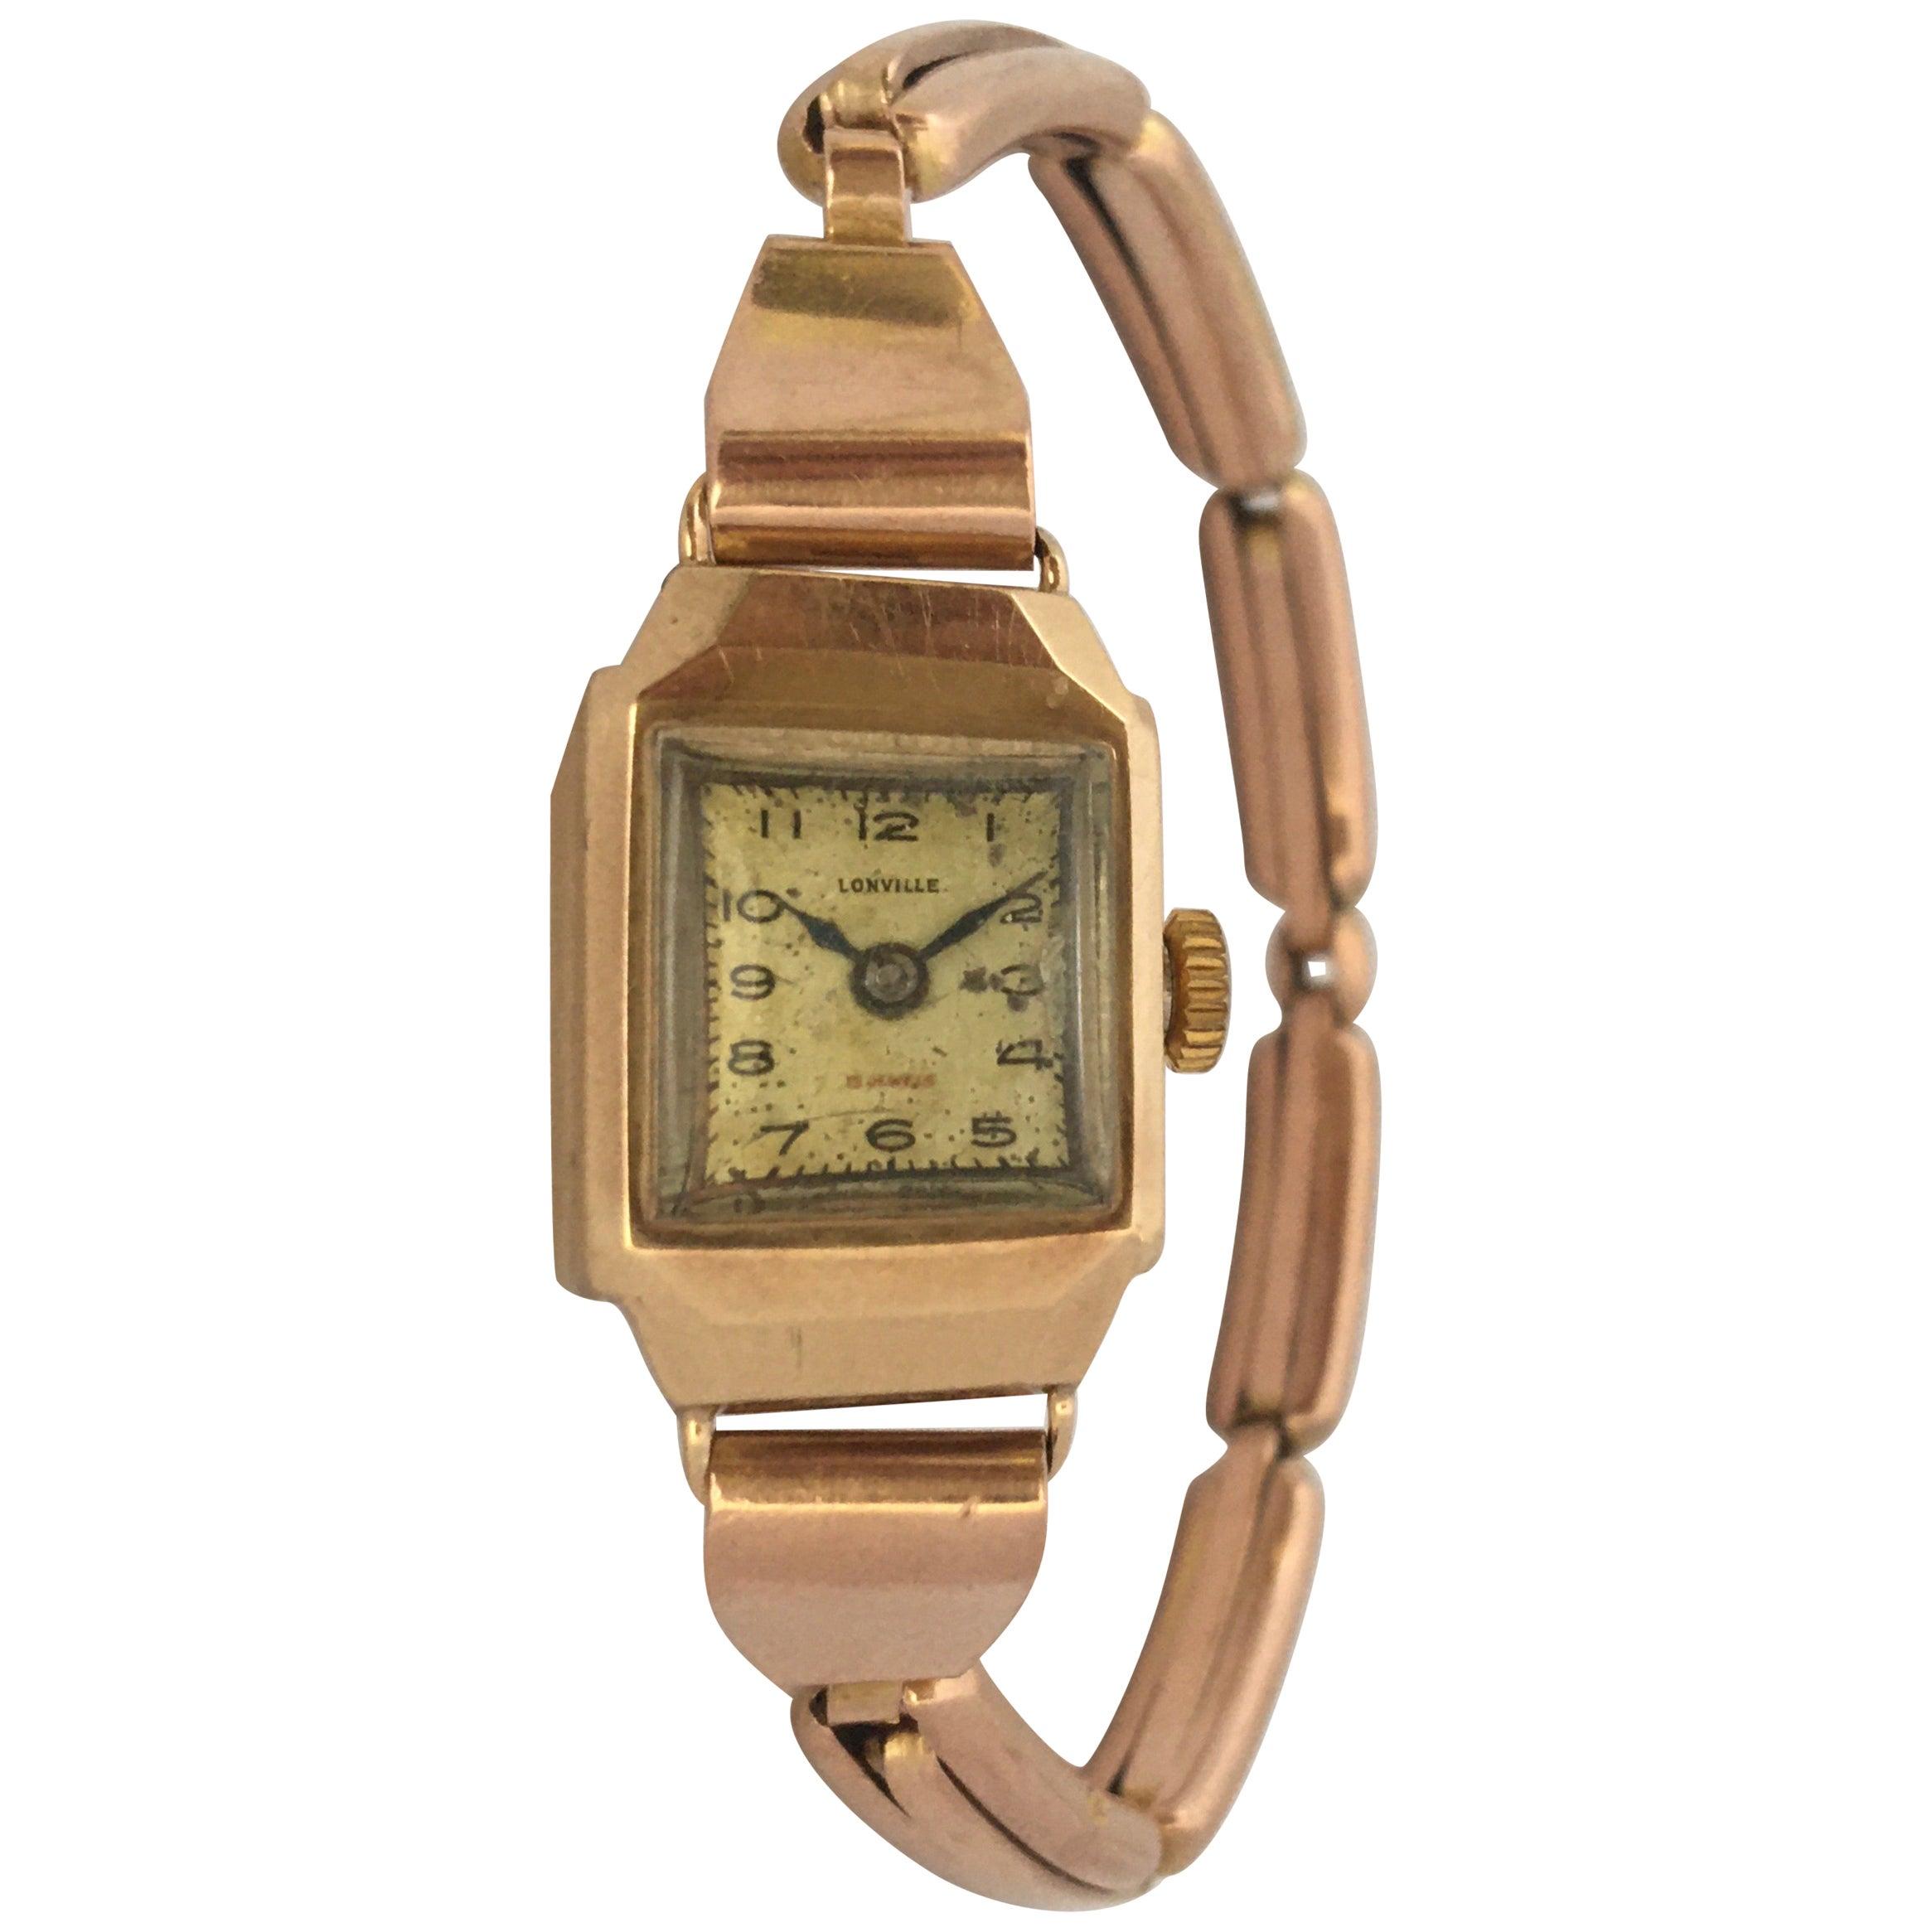 9 Karat Gold Vintage 1940s Ladies Swiss Mechanical Watch